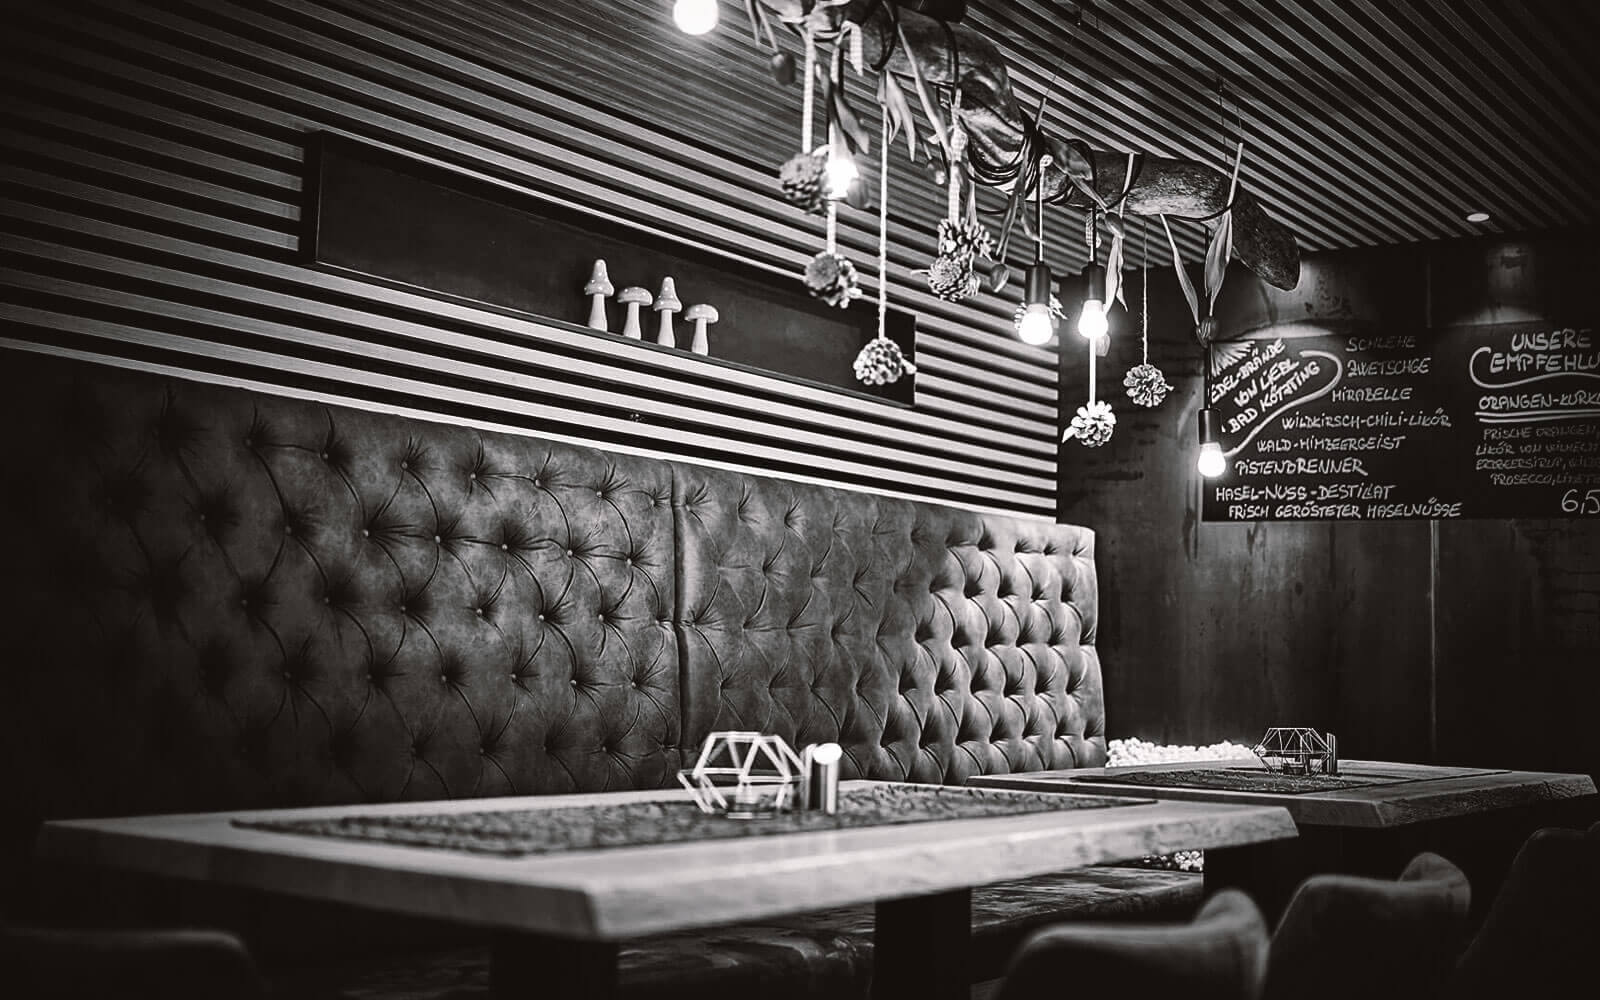 teamElgato Portfolio – Posthotel Rattenberg Titelbild